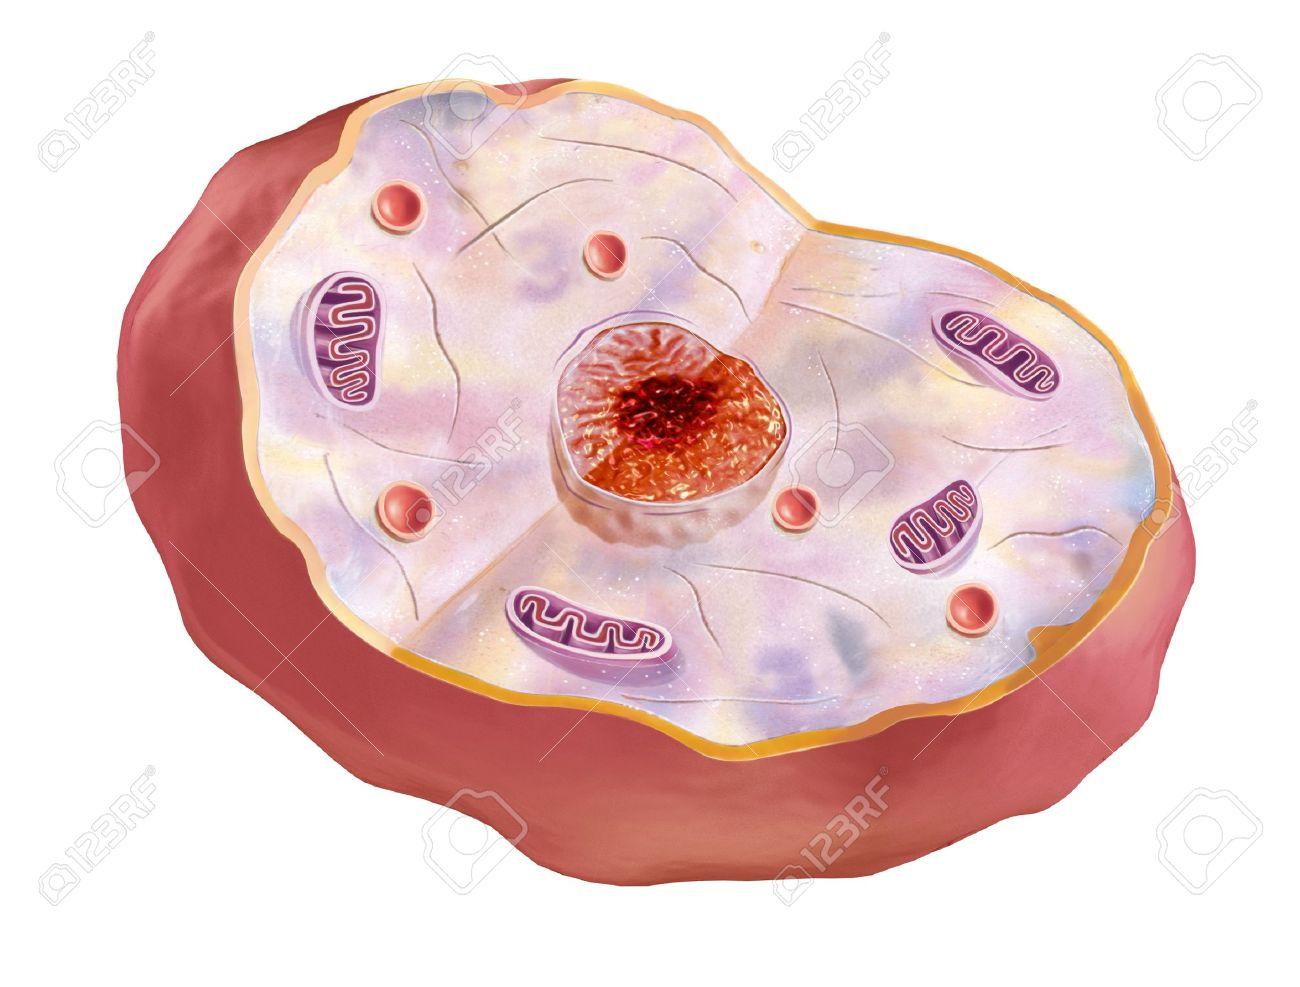 Human cell, anatomy image. 2 D illustration, on white background. Stock Illustration - 11779684